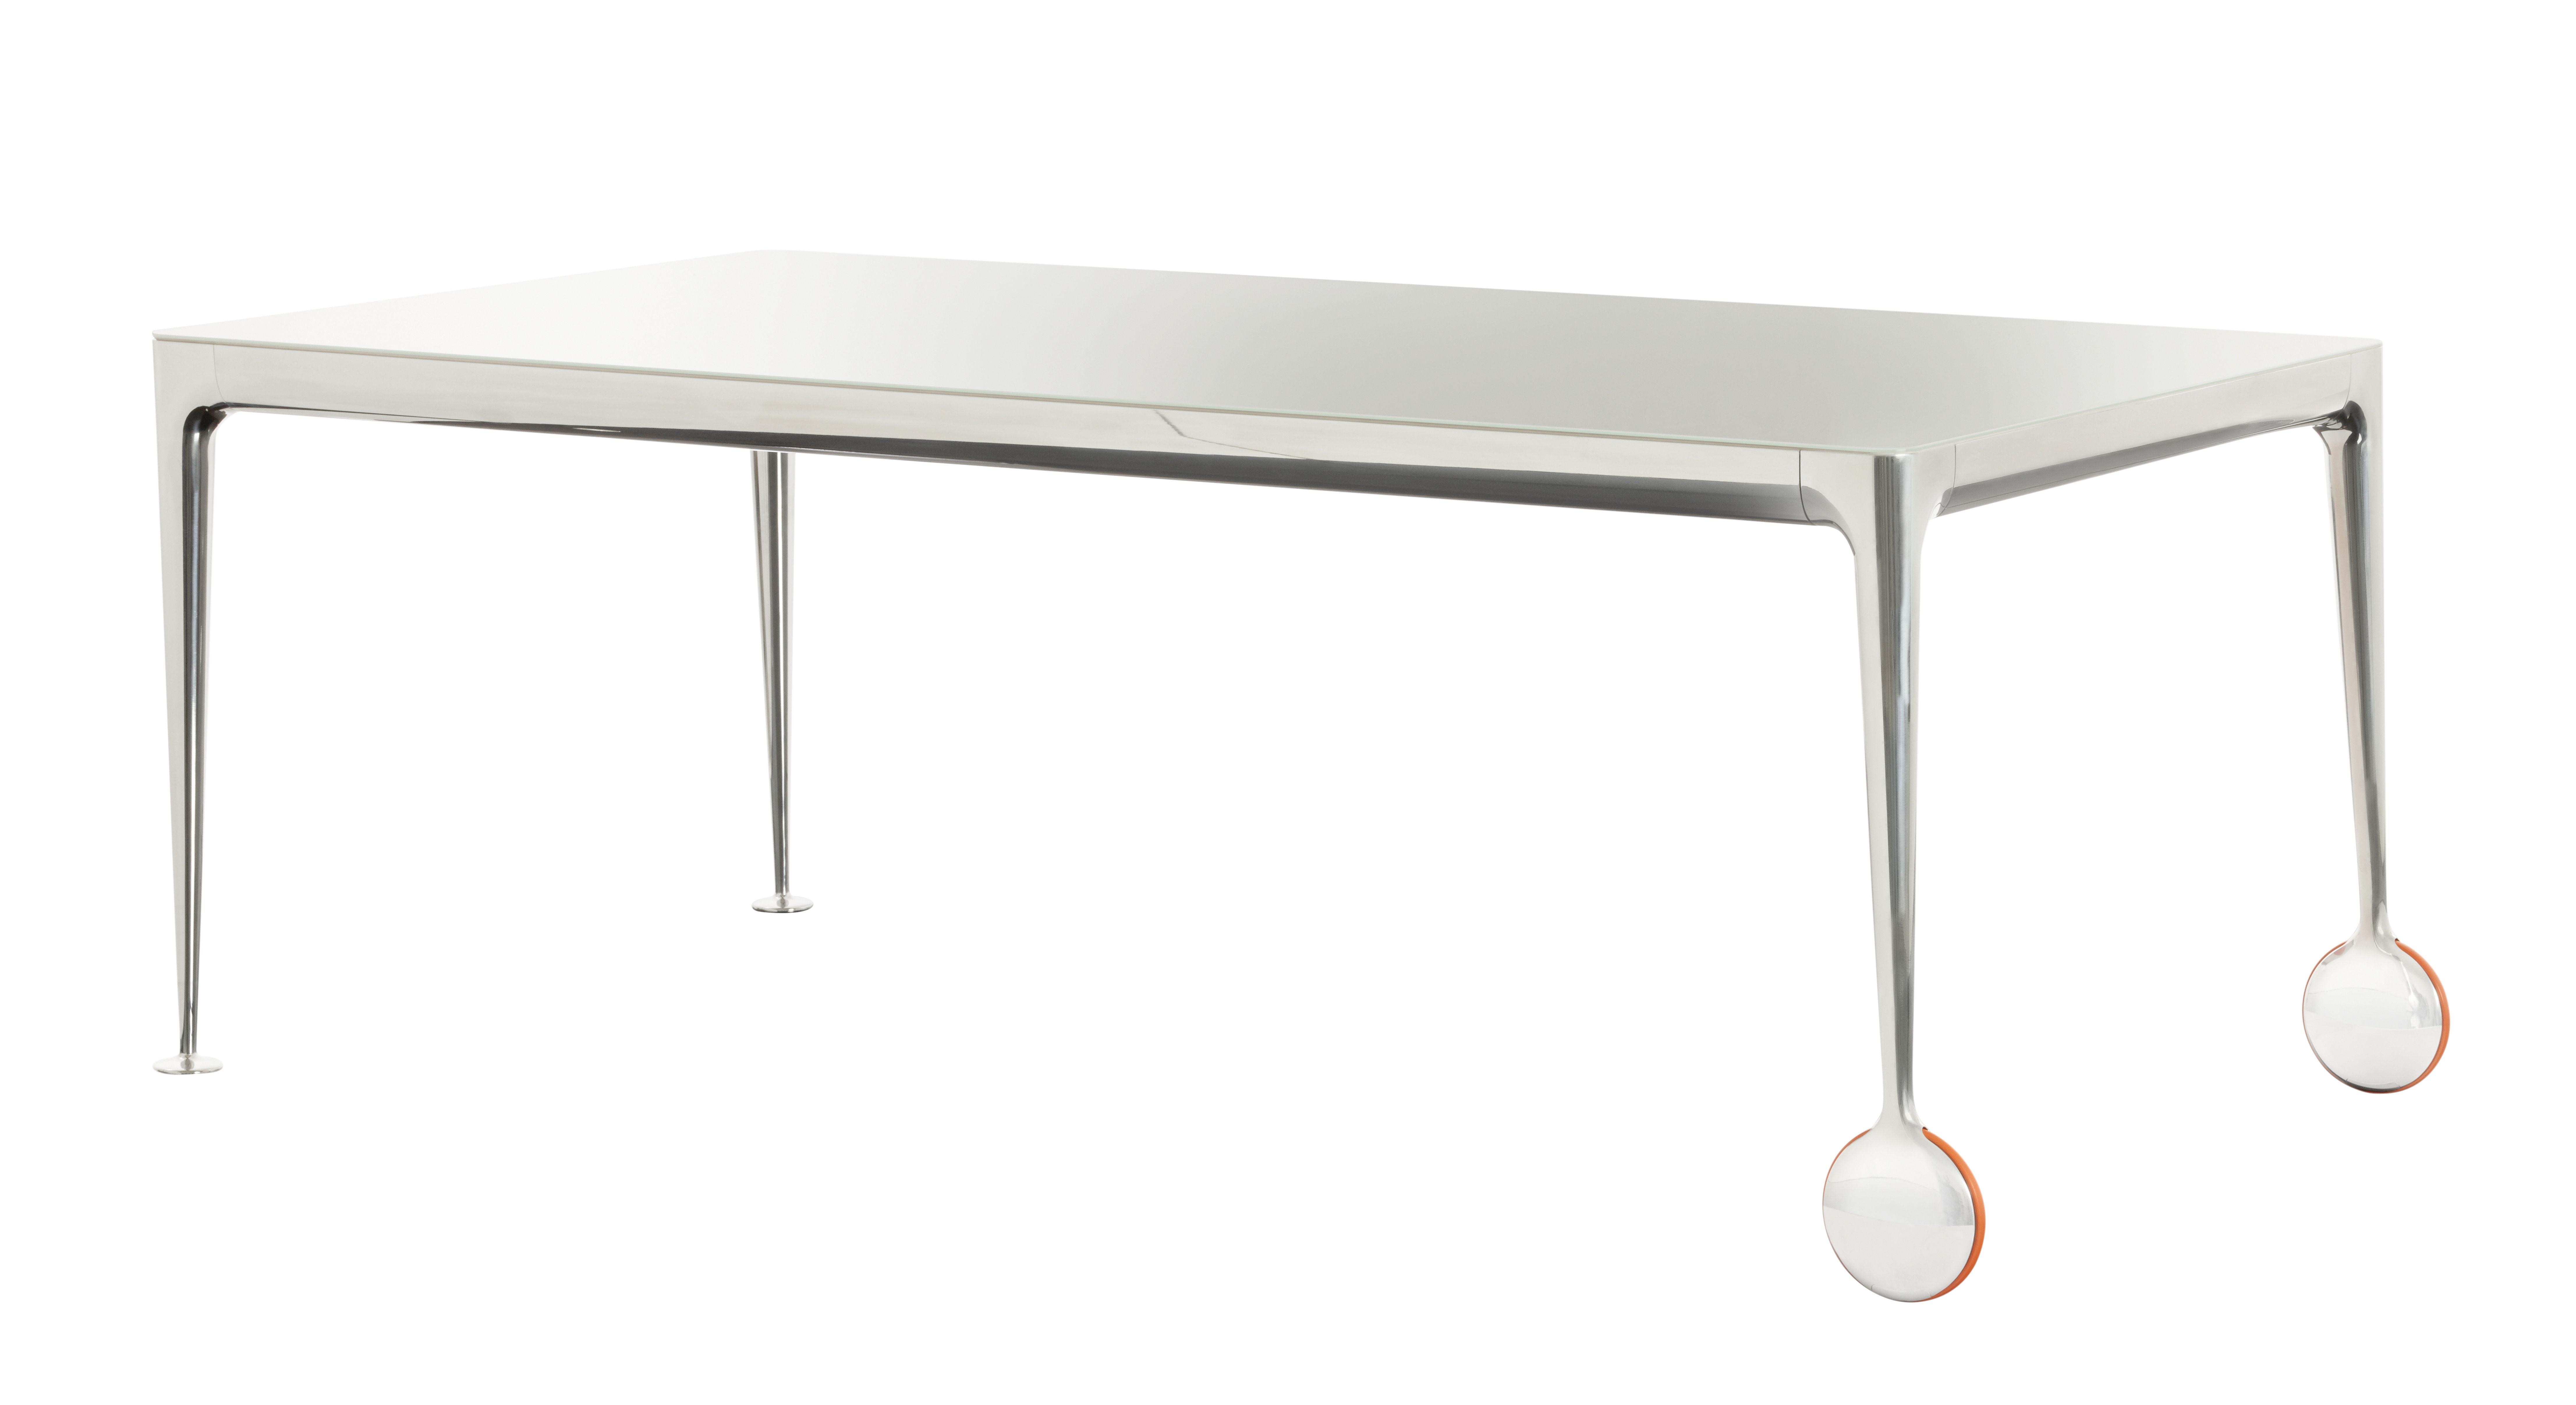 Table rectangulaire Big Will / 240 x 110 cm - Magis blanc/métal en métal/verre